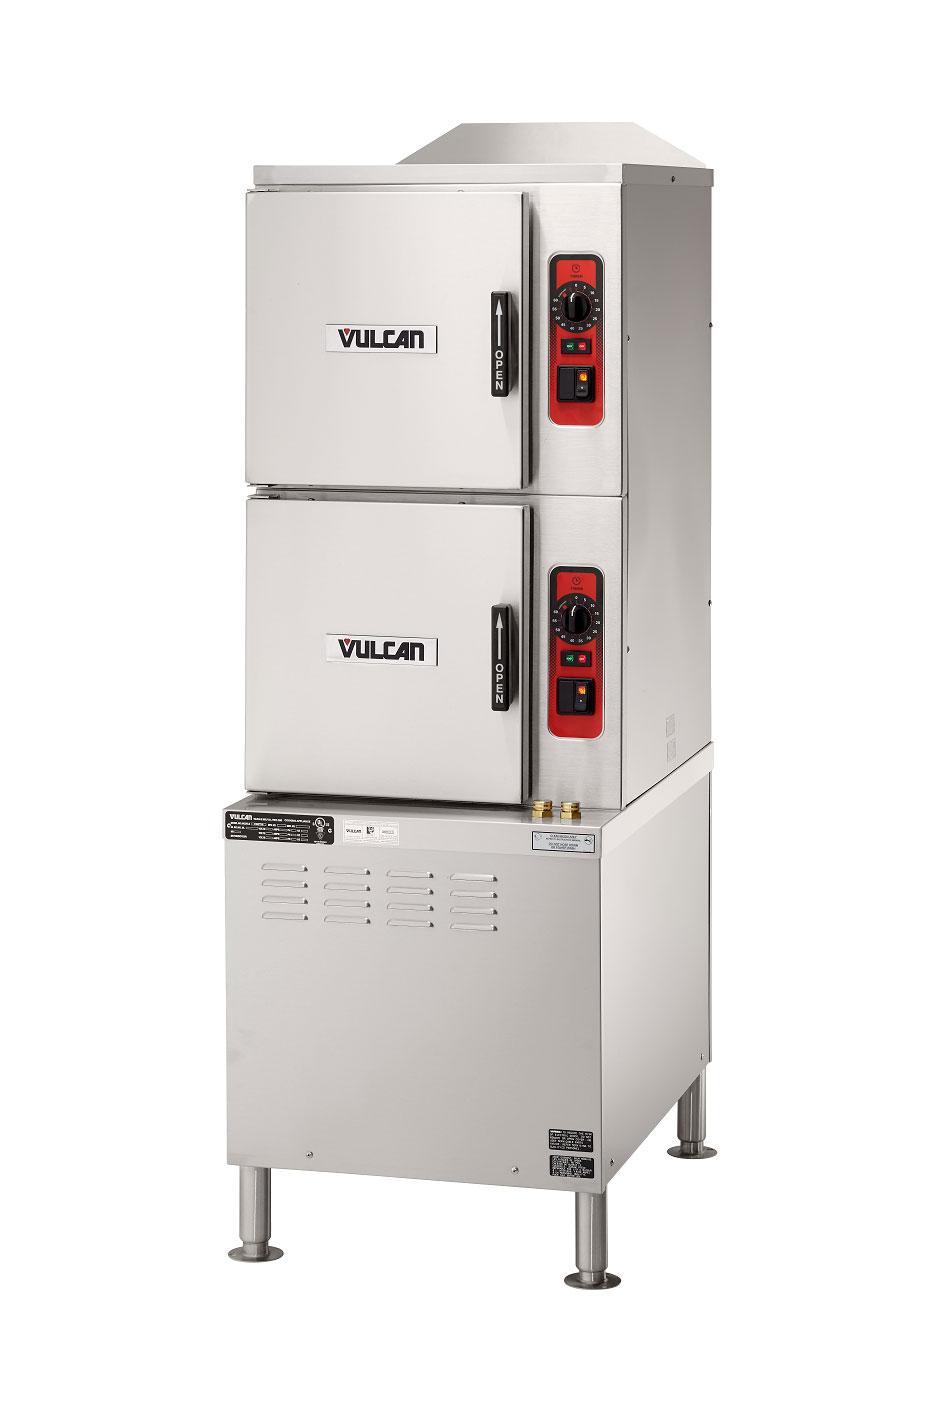 Vulcan C24ET6 steamer, convection, electric, floor model